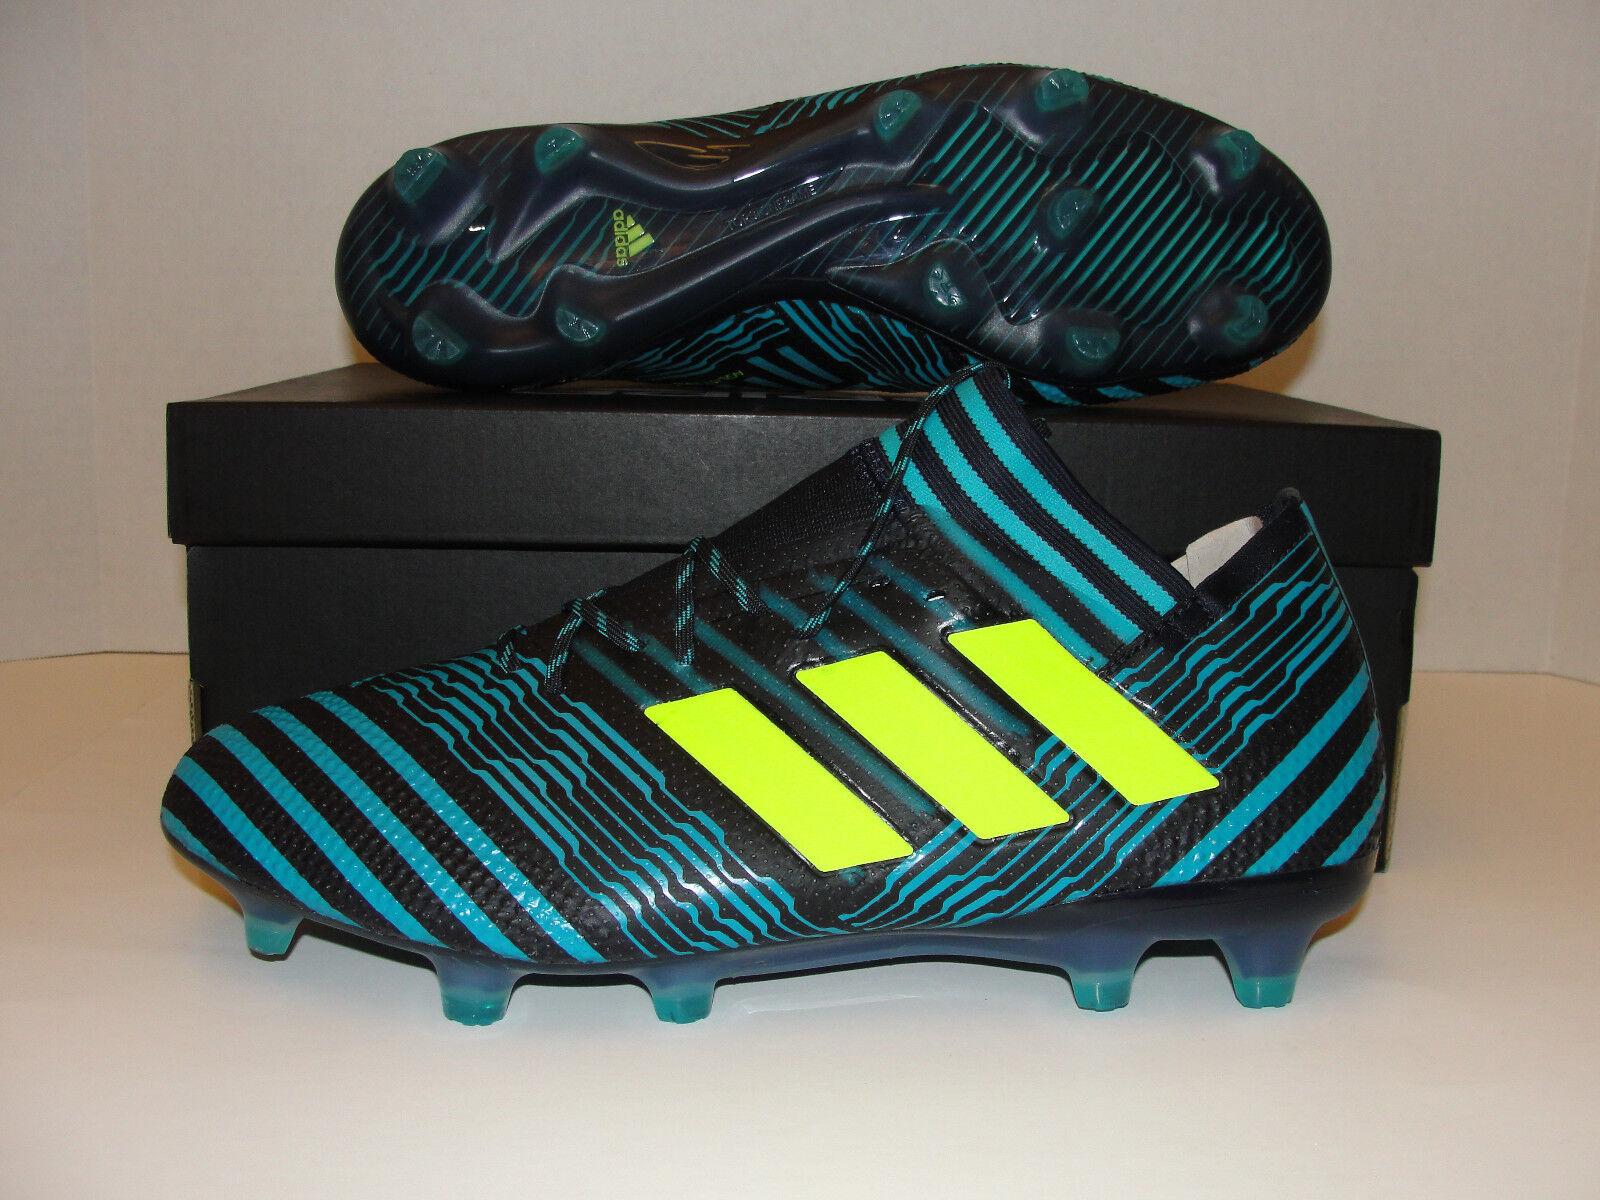 Adidas Nemeziz 17.1 FG Soccer Cleats Black Blue Yellow BB6078 Men 8